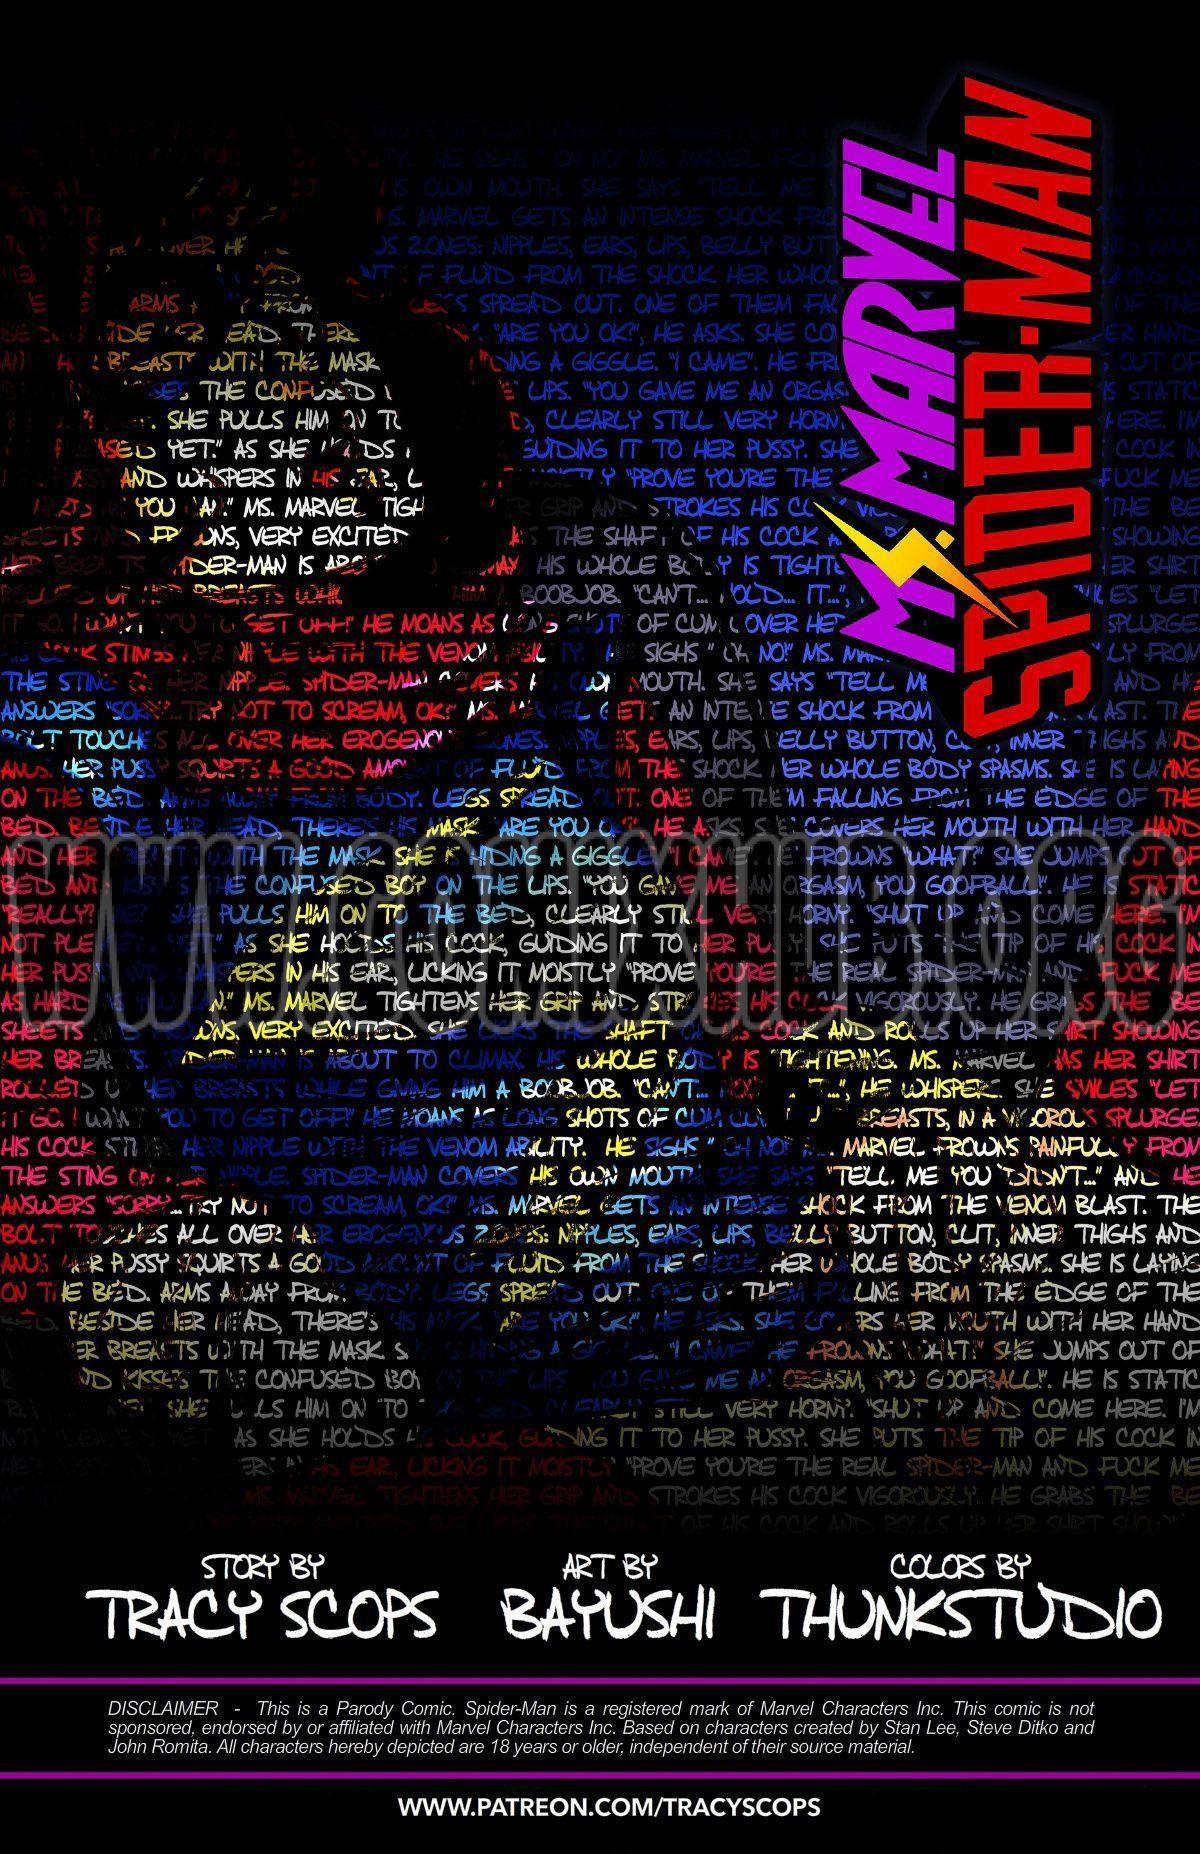 Ms.Marvel - Spiderman 2 porn comics Masturbation, Anal Sex